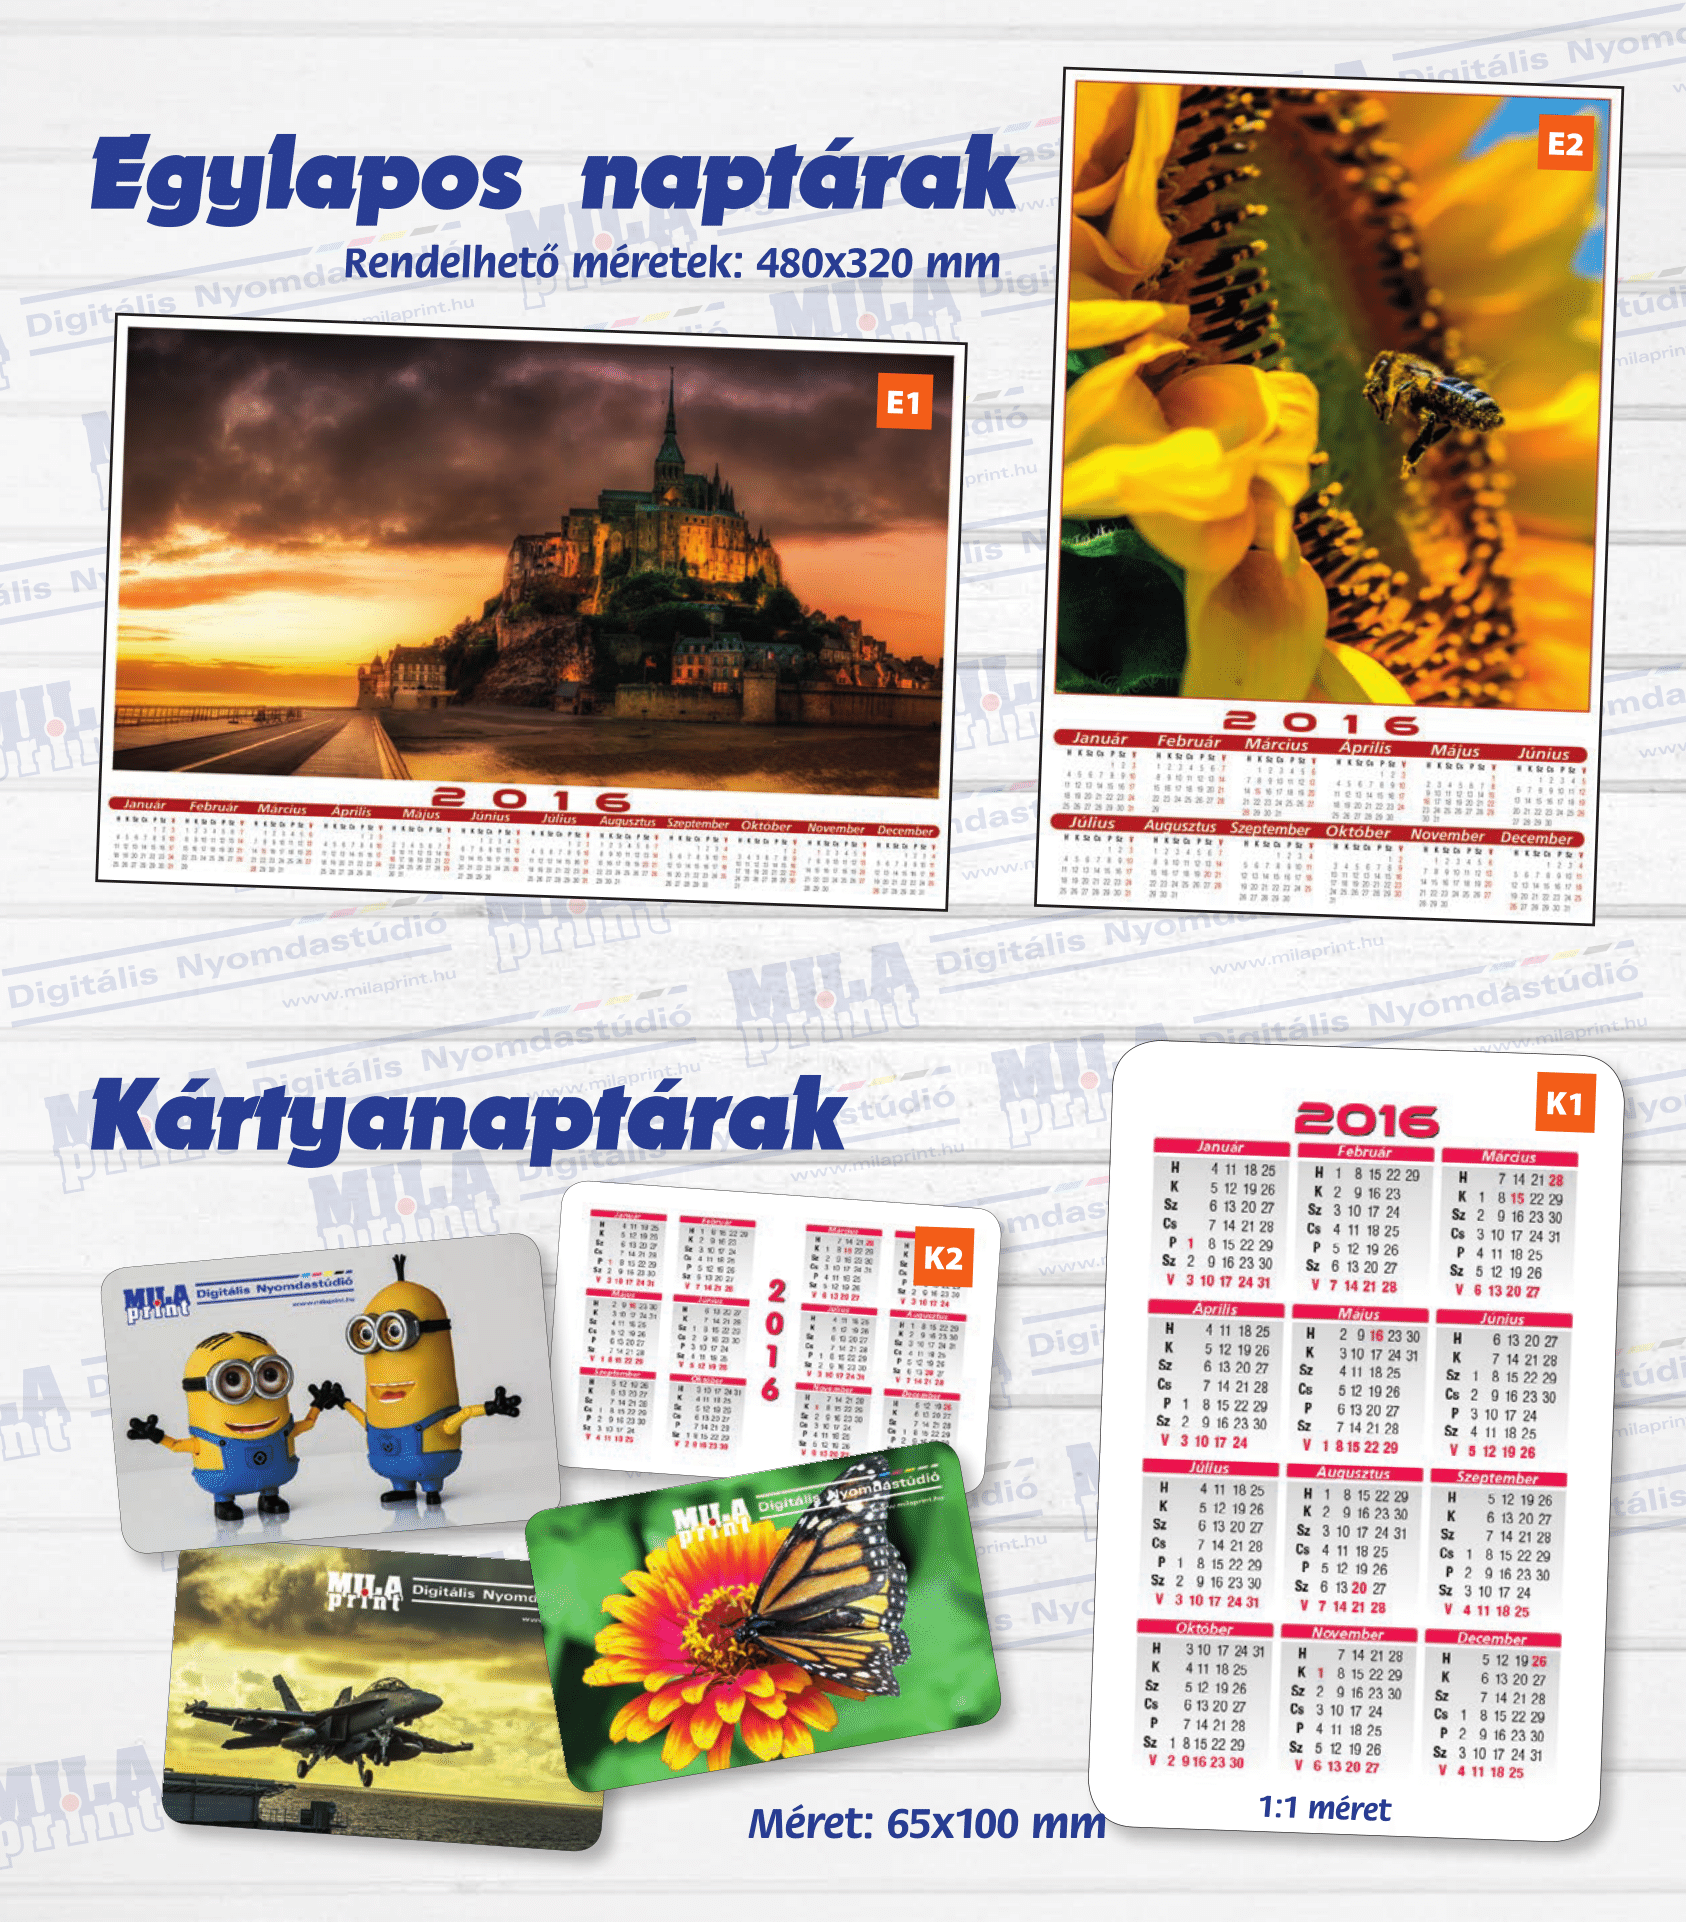 milaprint-2016-katalog-netre.compressed-5